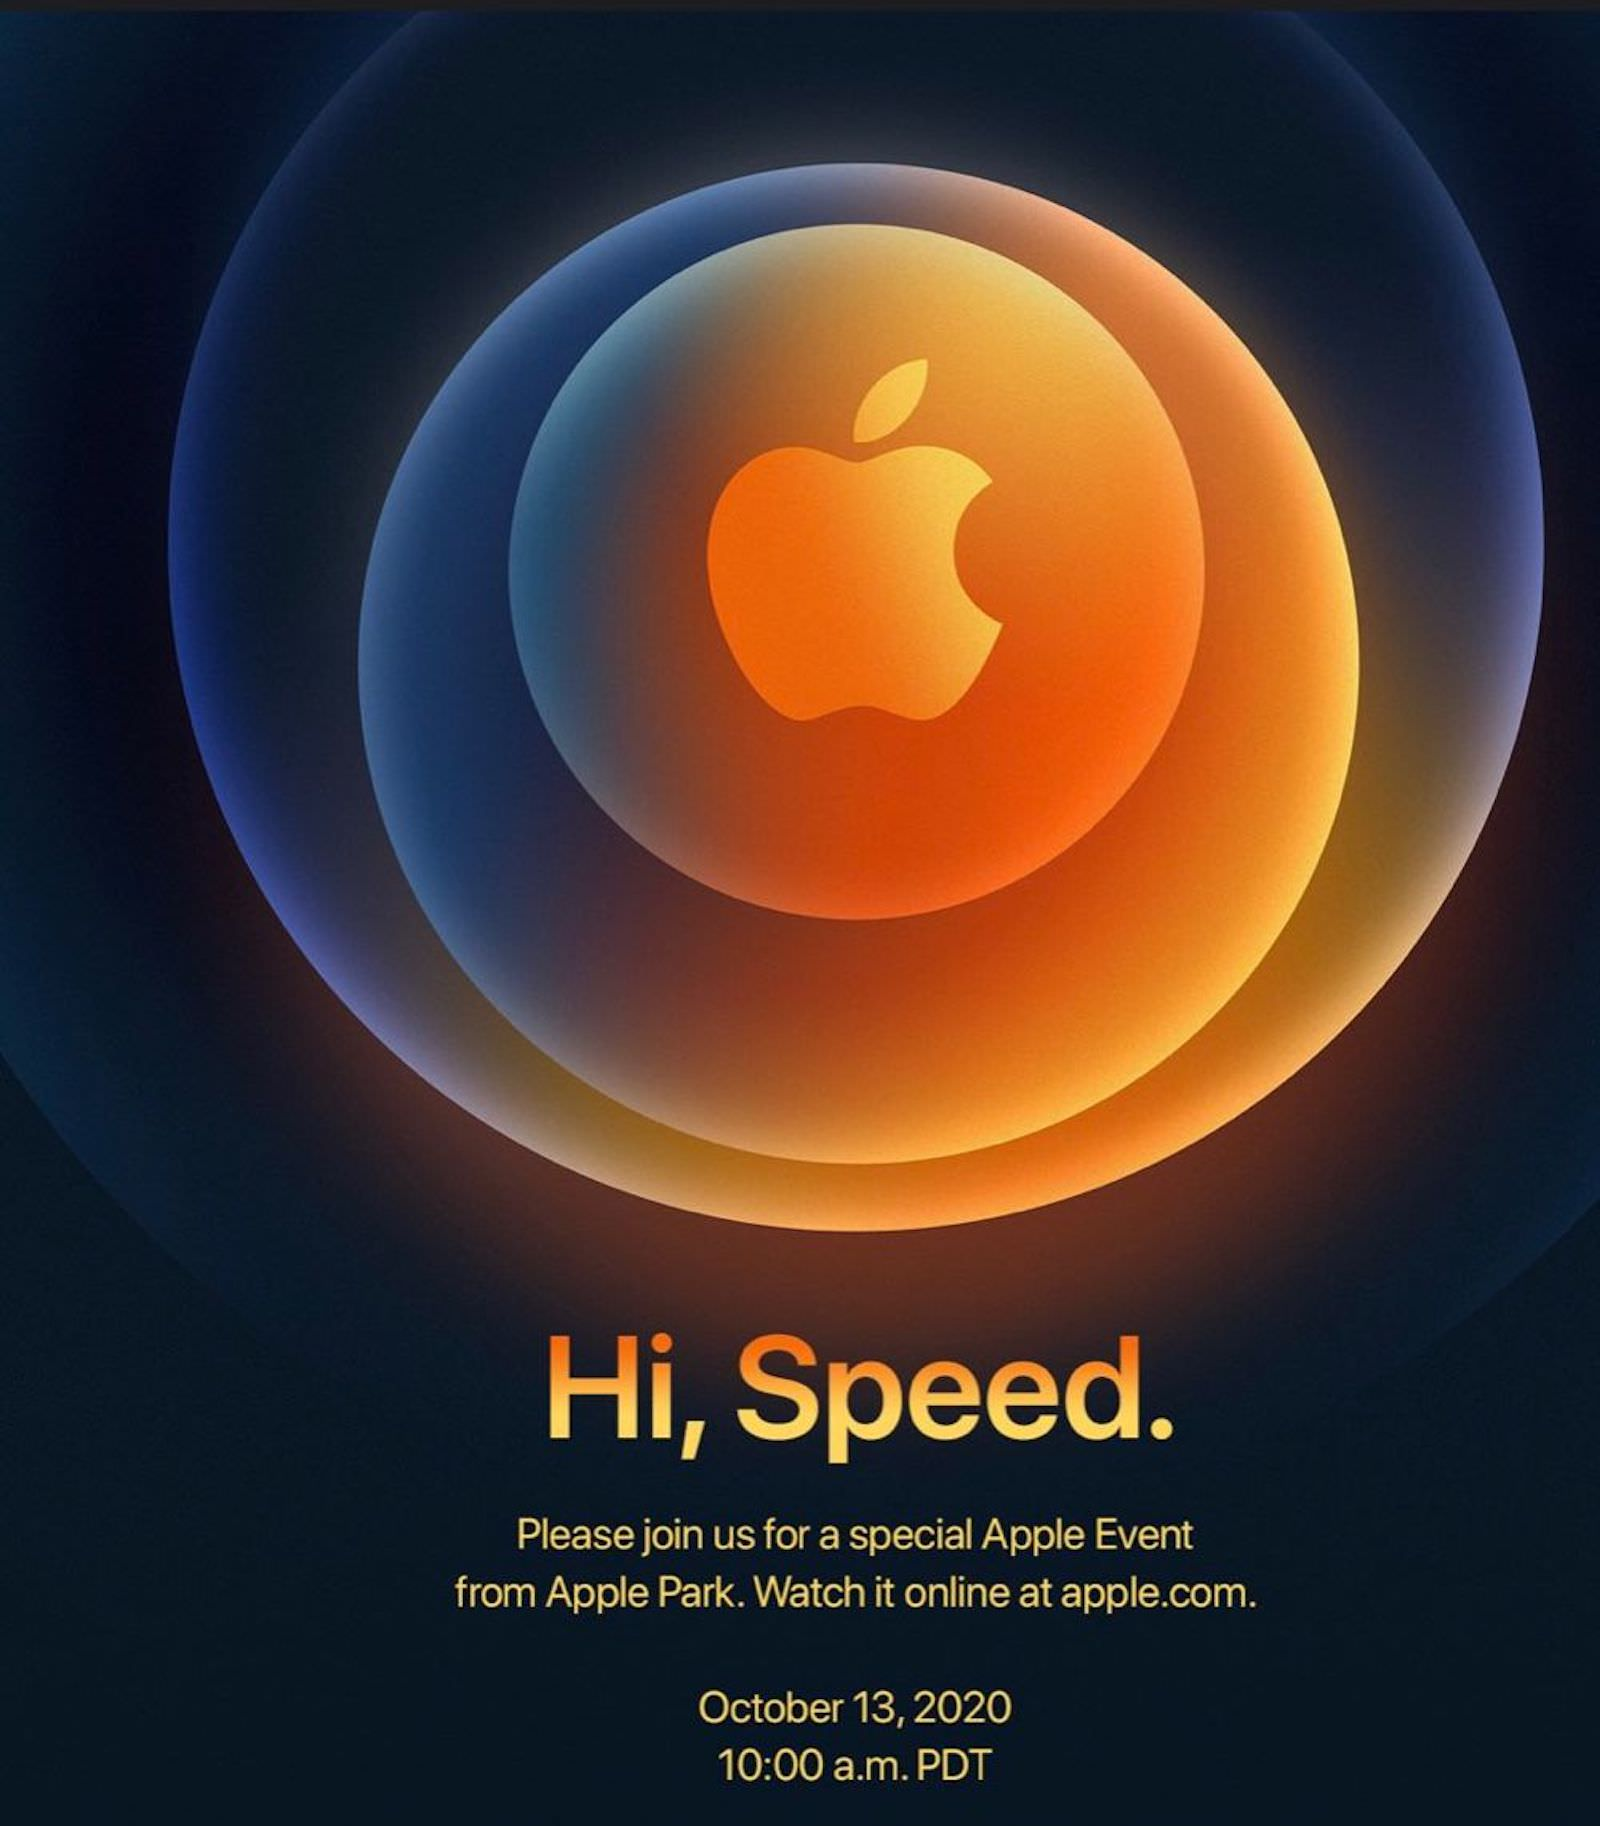 Hi Speed Apple Event